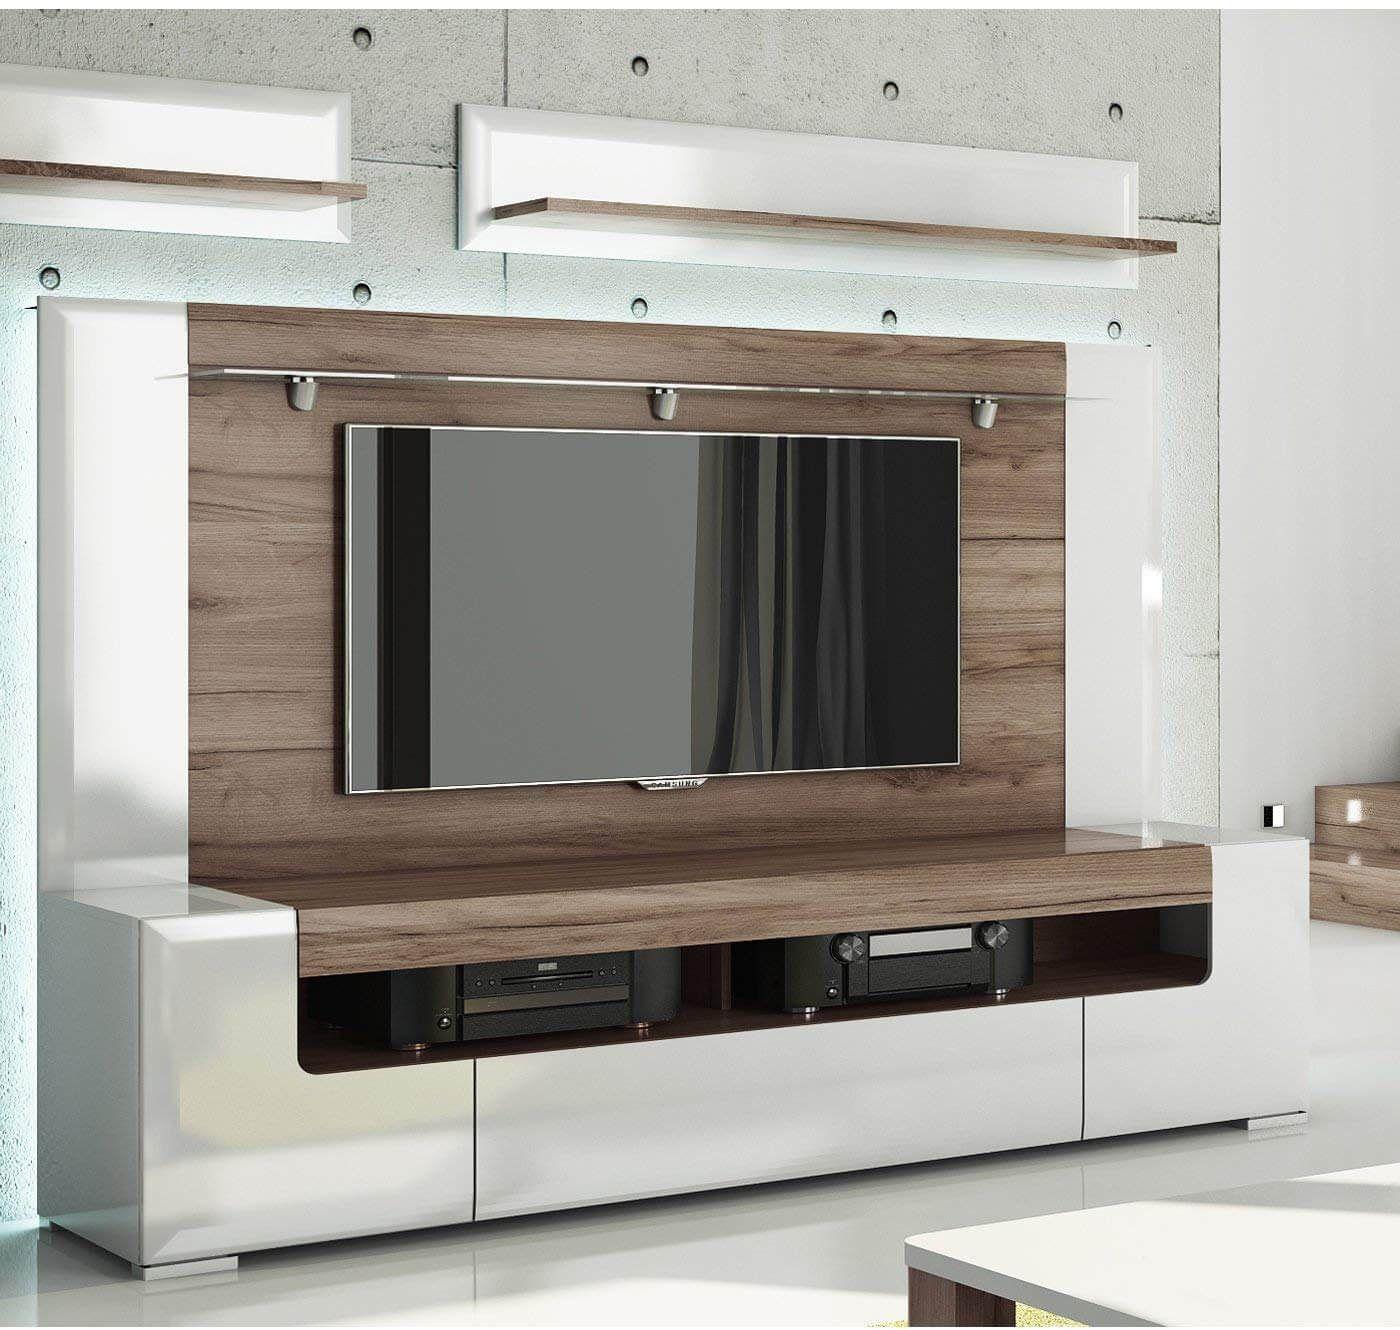 35 Modern Led Tv Wall Panel Designs For Your Living Room Li